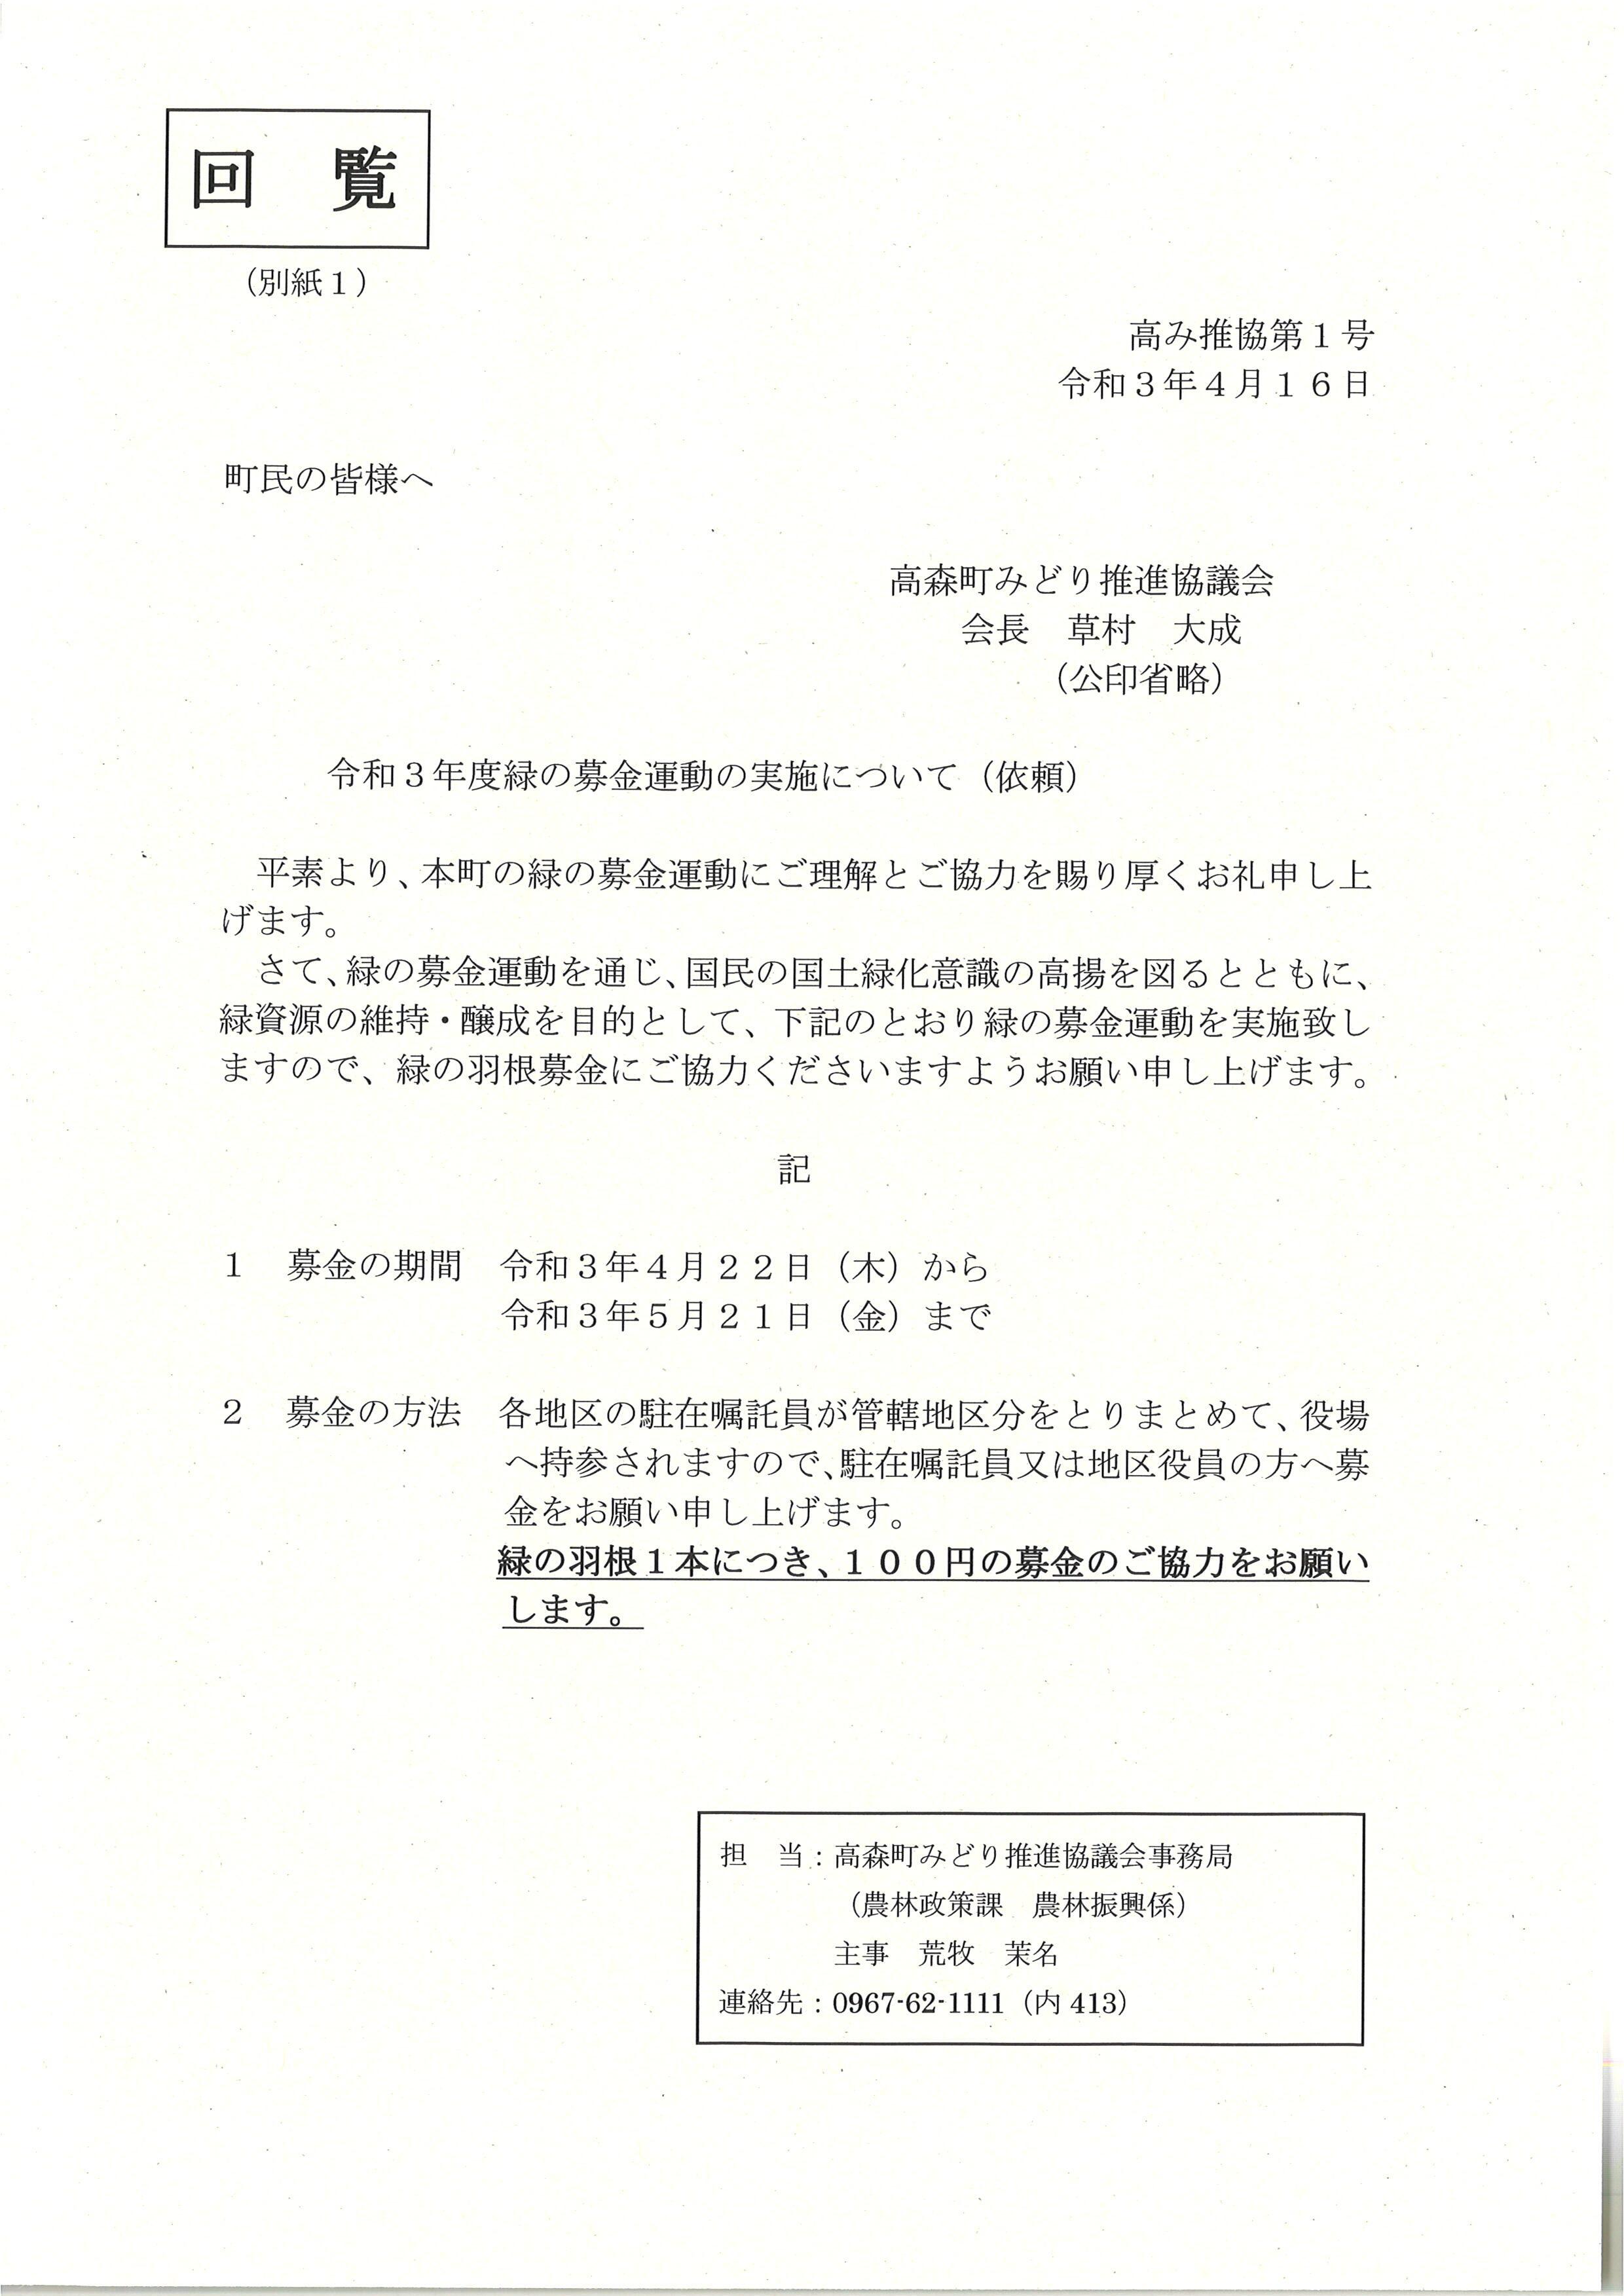 http://www.town.takamori.kumamoto.jp/chosha/somu/upload/6c5bd8177126f138213543840e9798938d544cc5.jpg